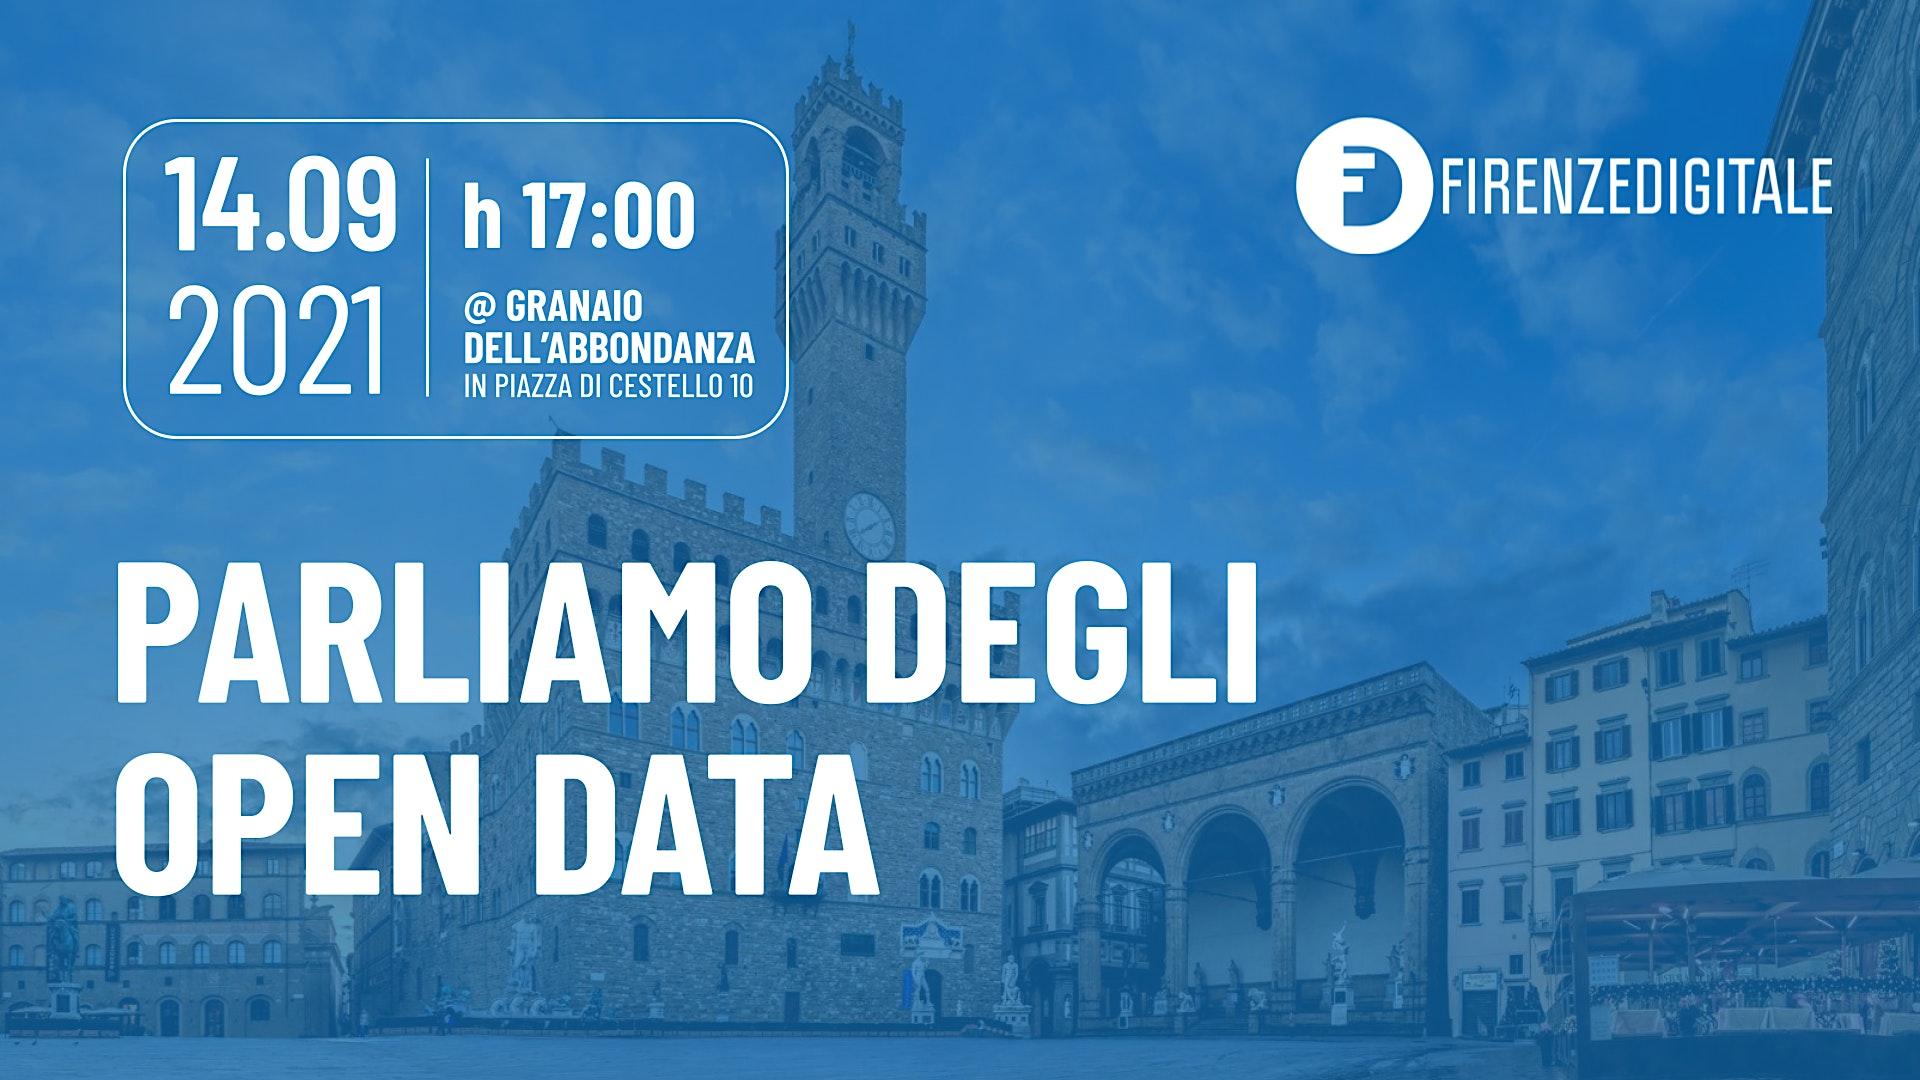 Firenze Digitale: Parliamo Degli Open Data